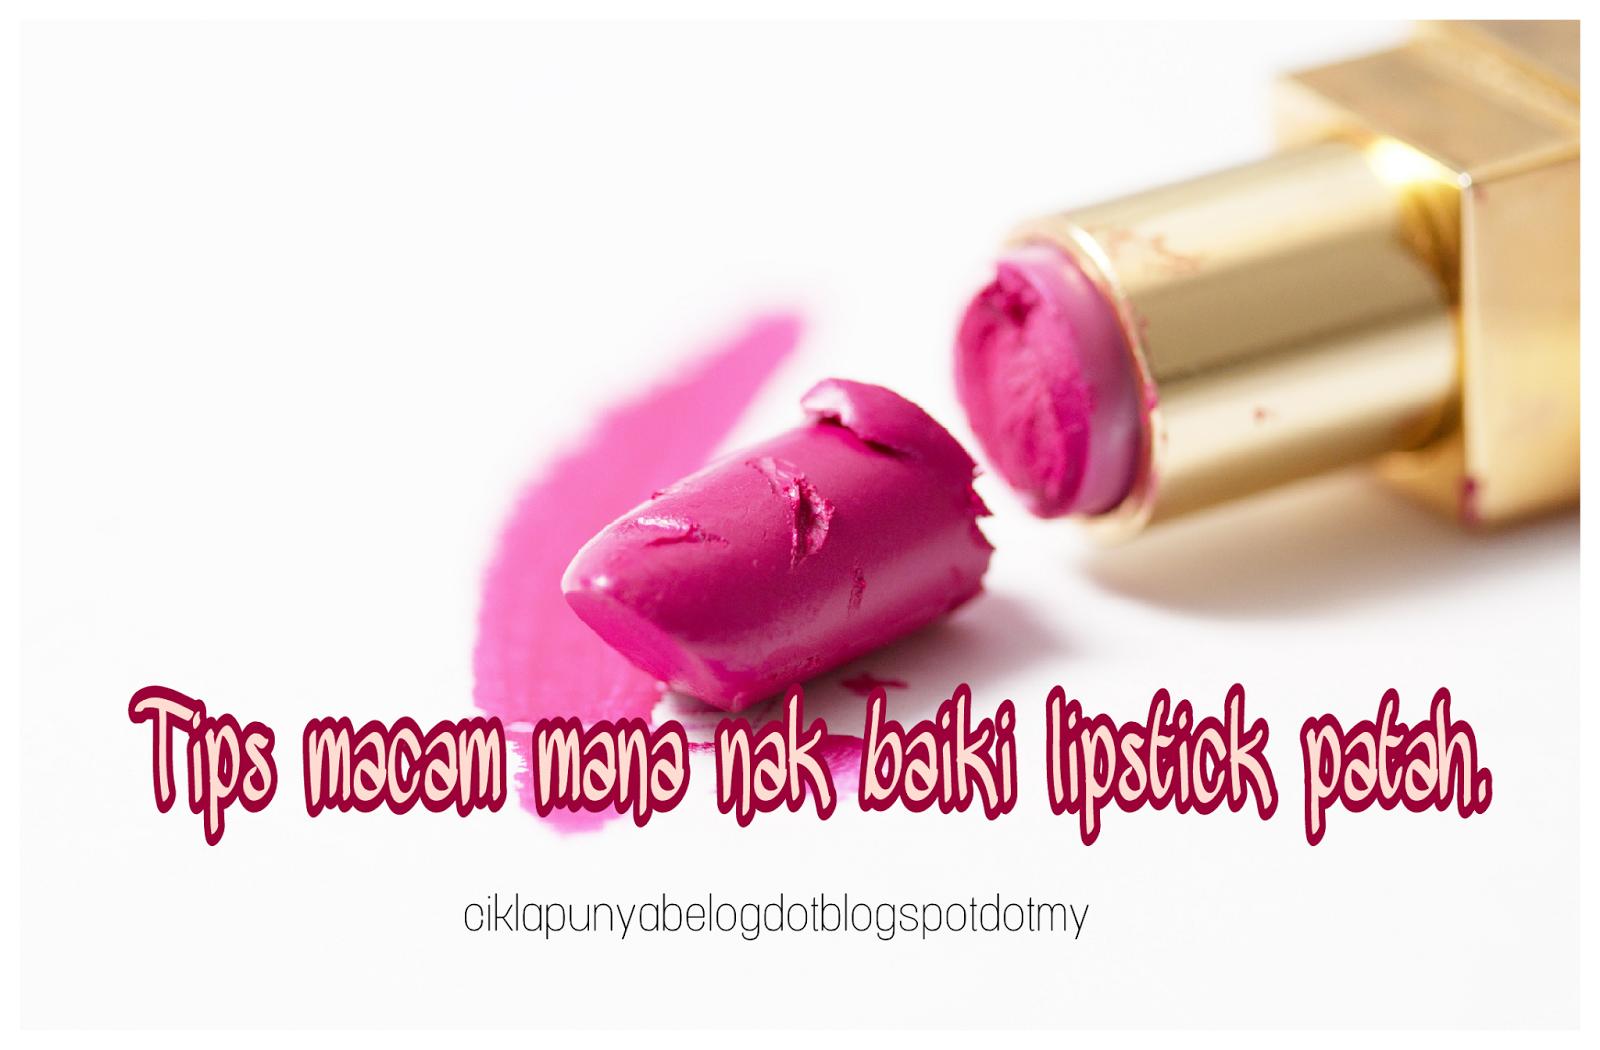 Tips macam mana nak baiki lipstick patah.